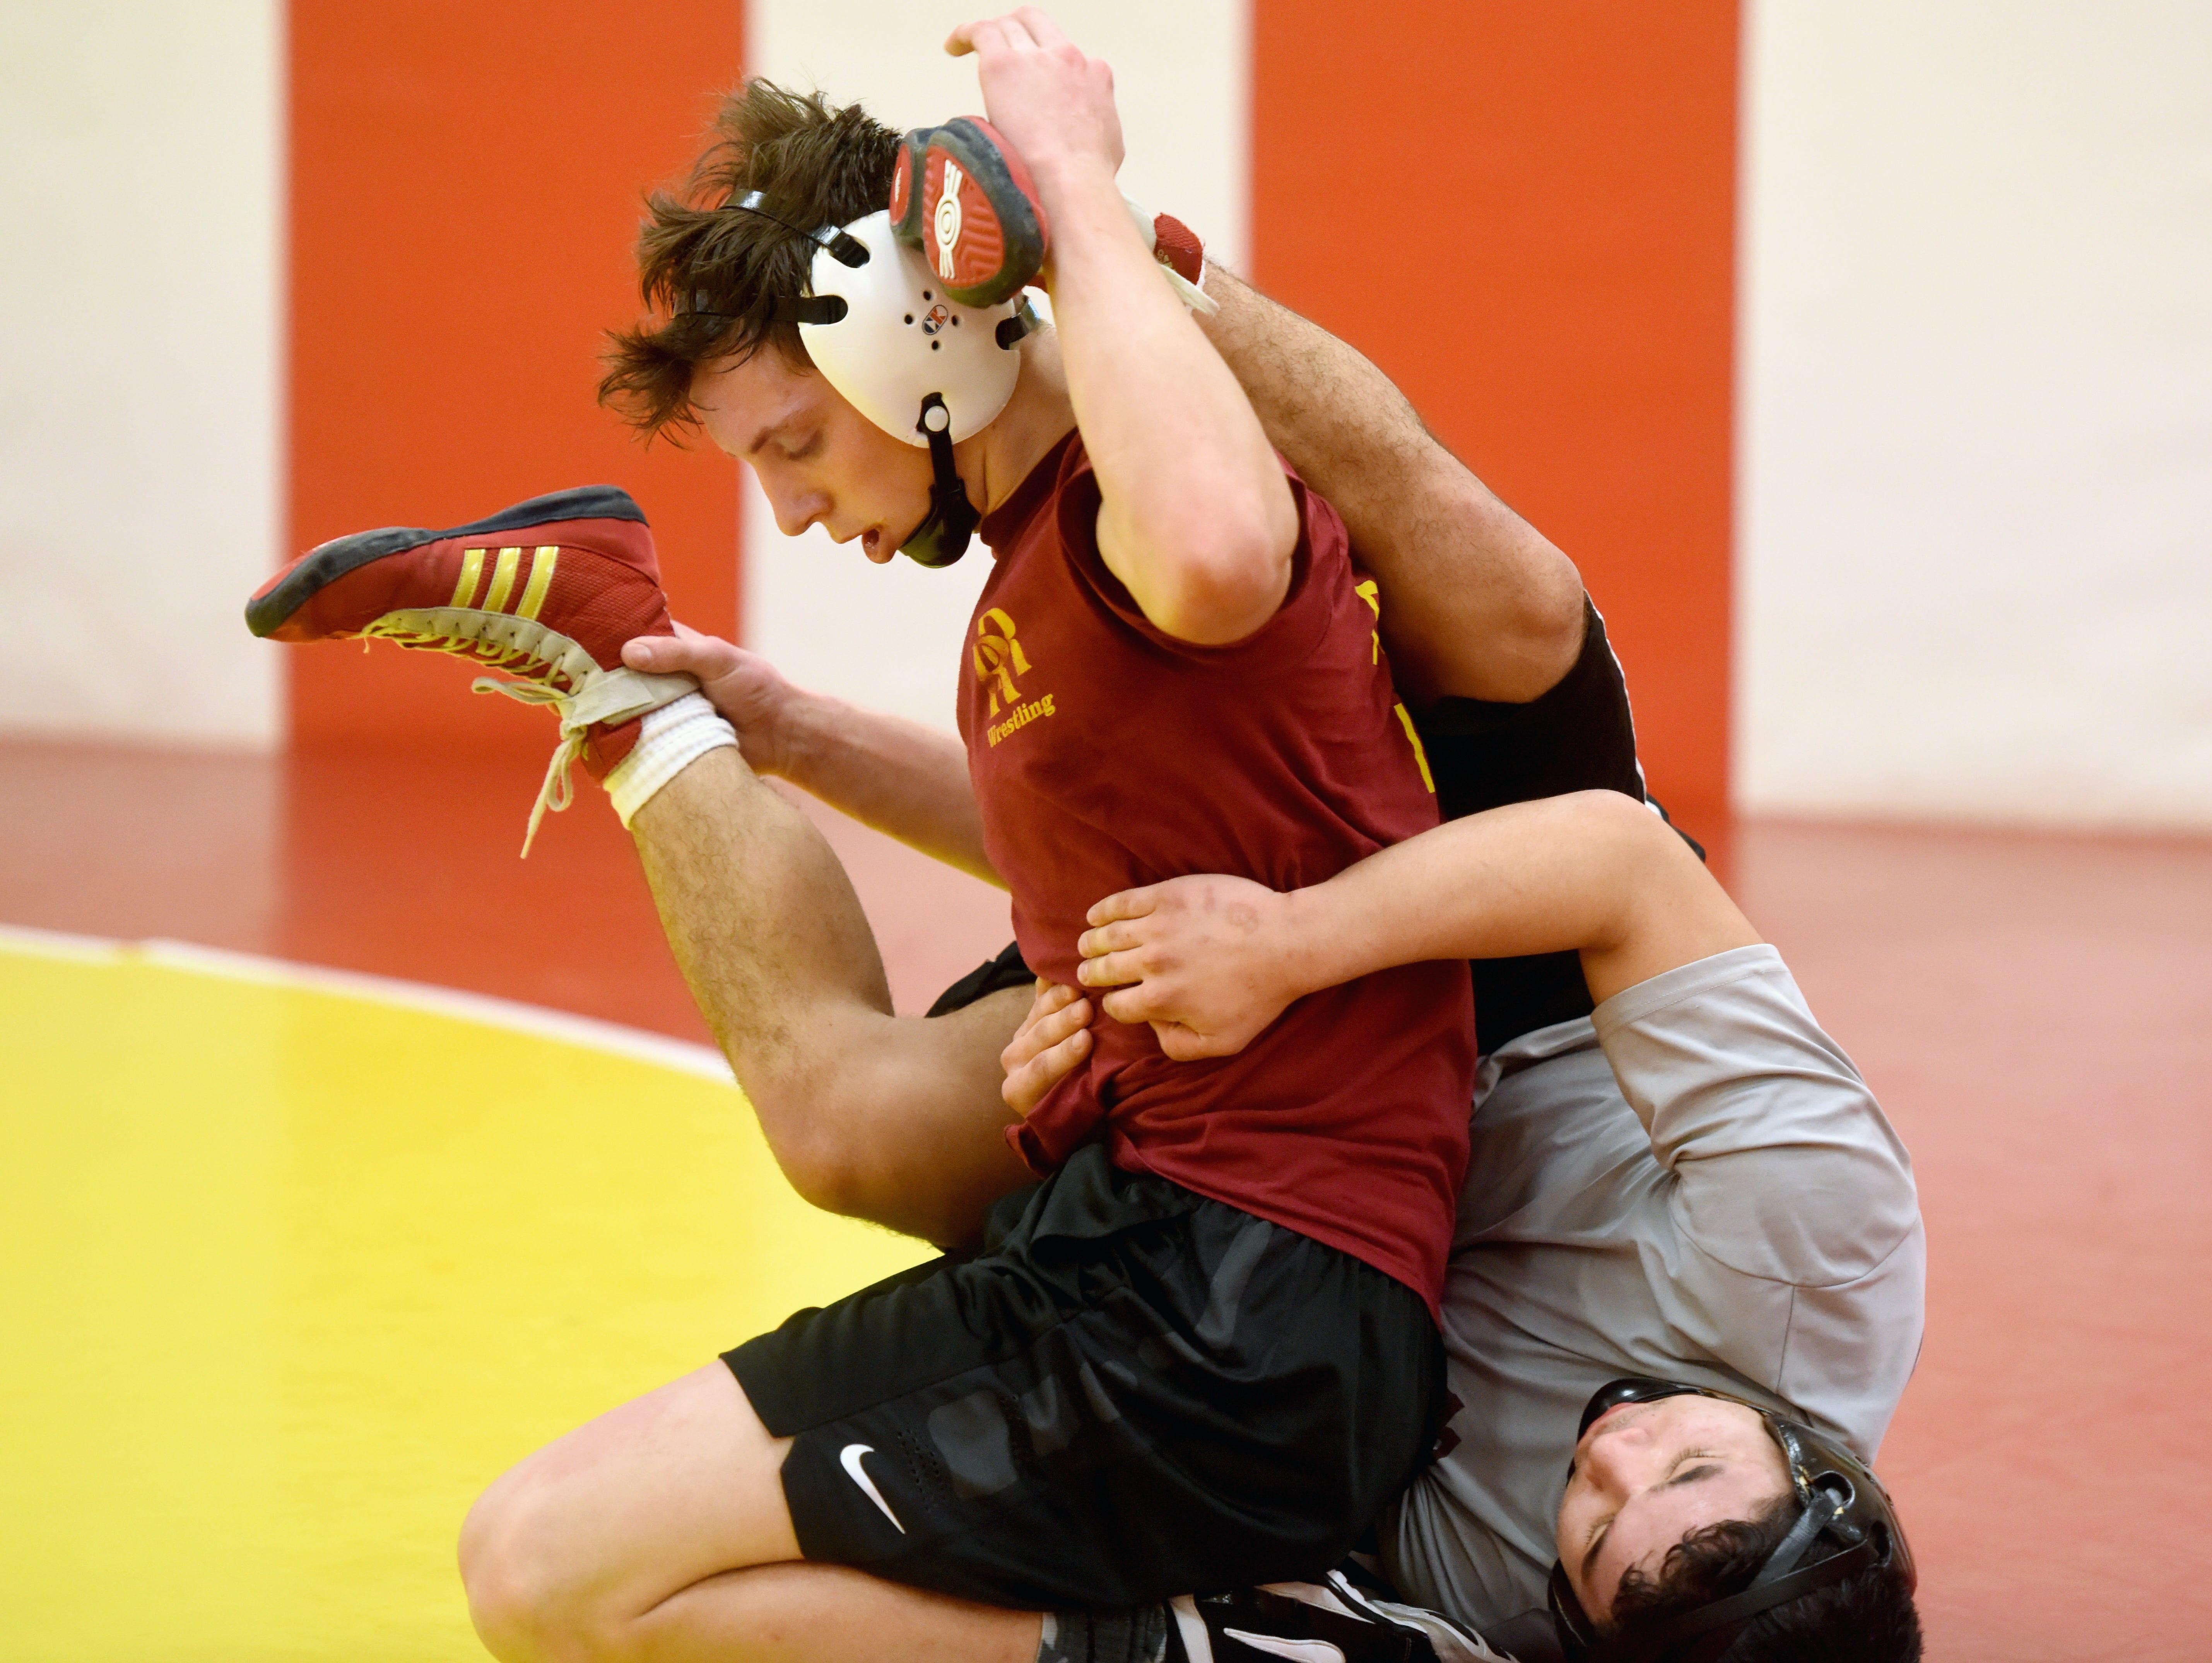 RooseveltÕs Carter Lohr wrestles teammate Josh Cid during practice on Wednesday.